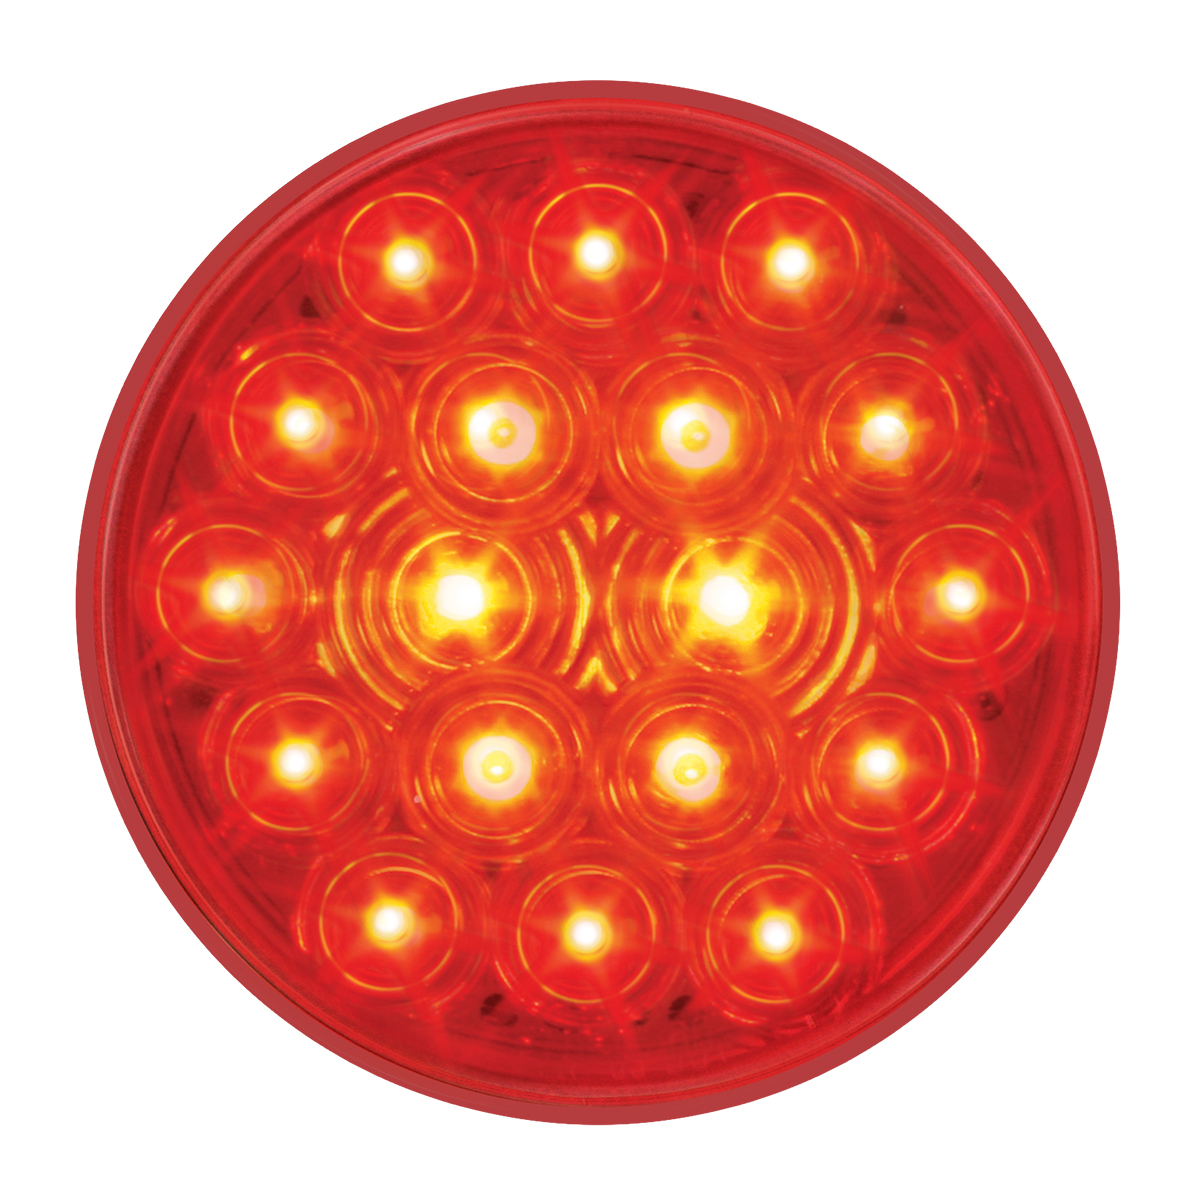 "#76452 - 4"" Round Fleet LED Flat Red/Red Light"